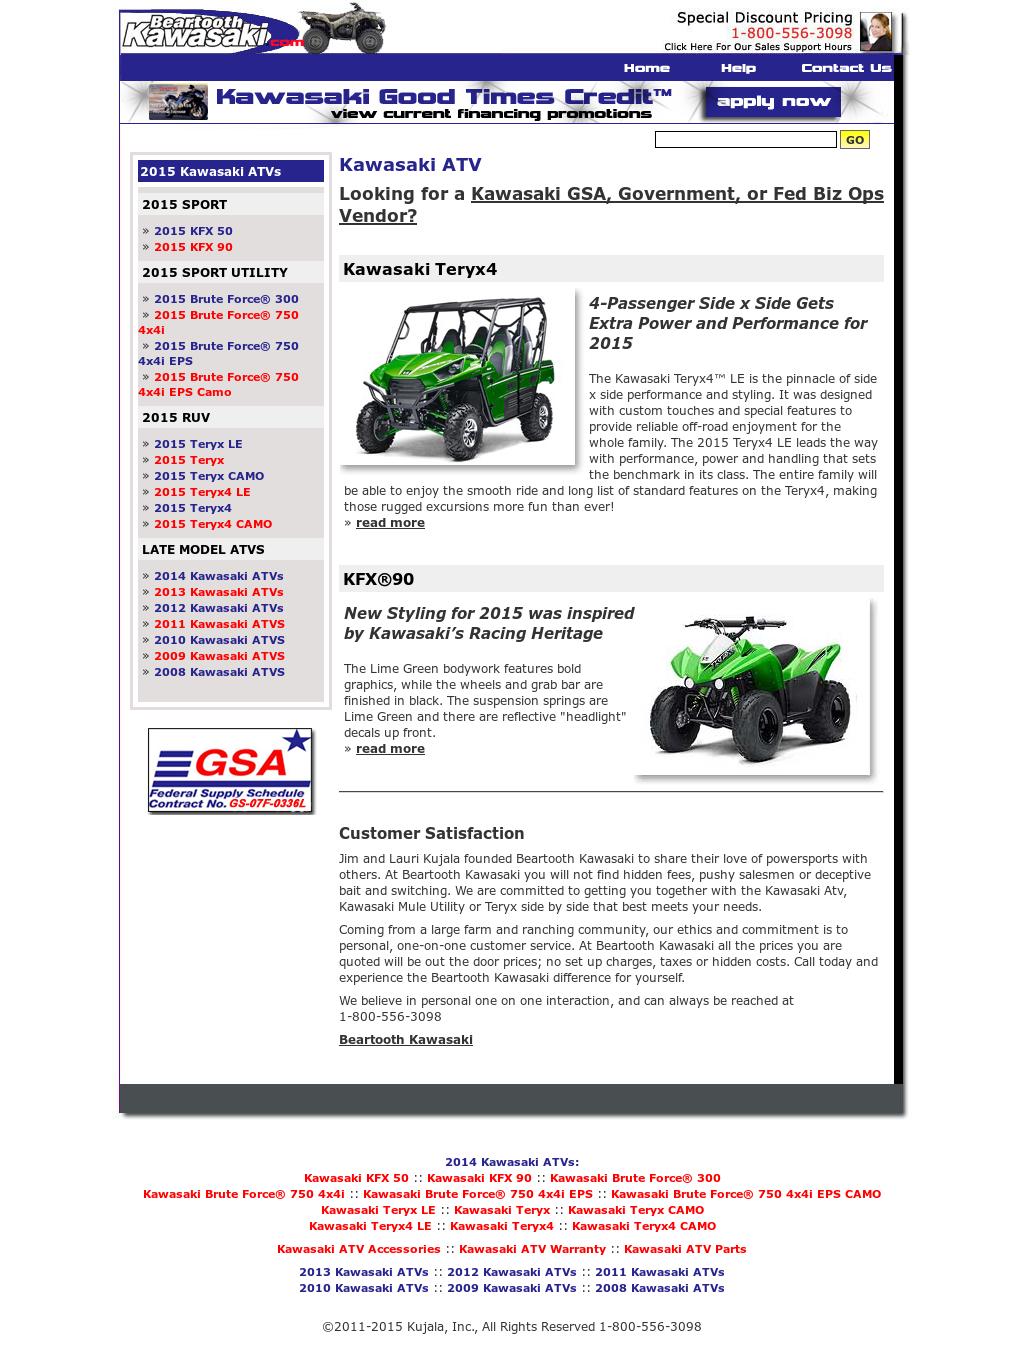 Kawasaki Atv Competitors, Revenue and Employees - Owler